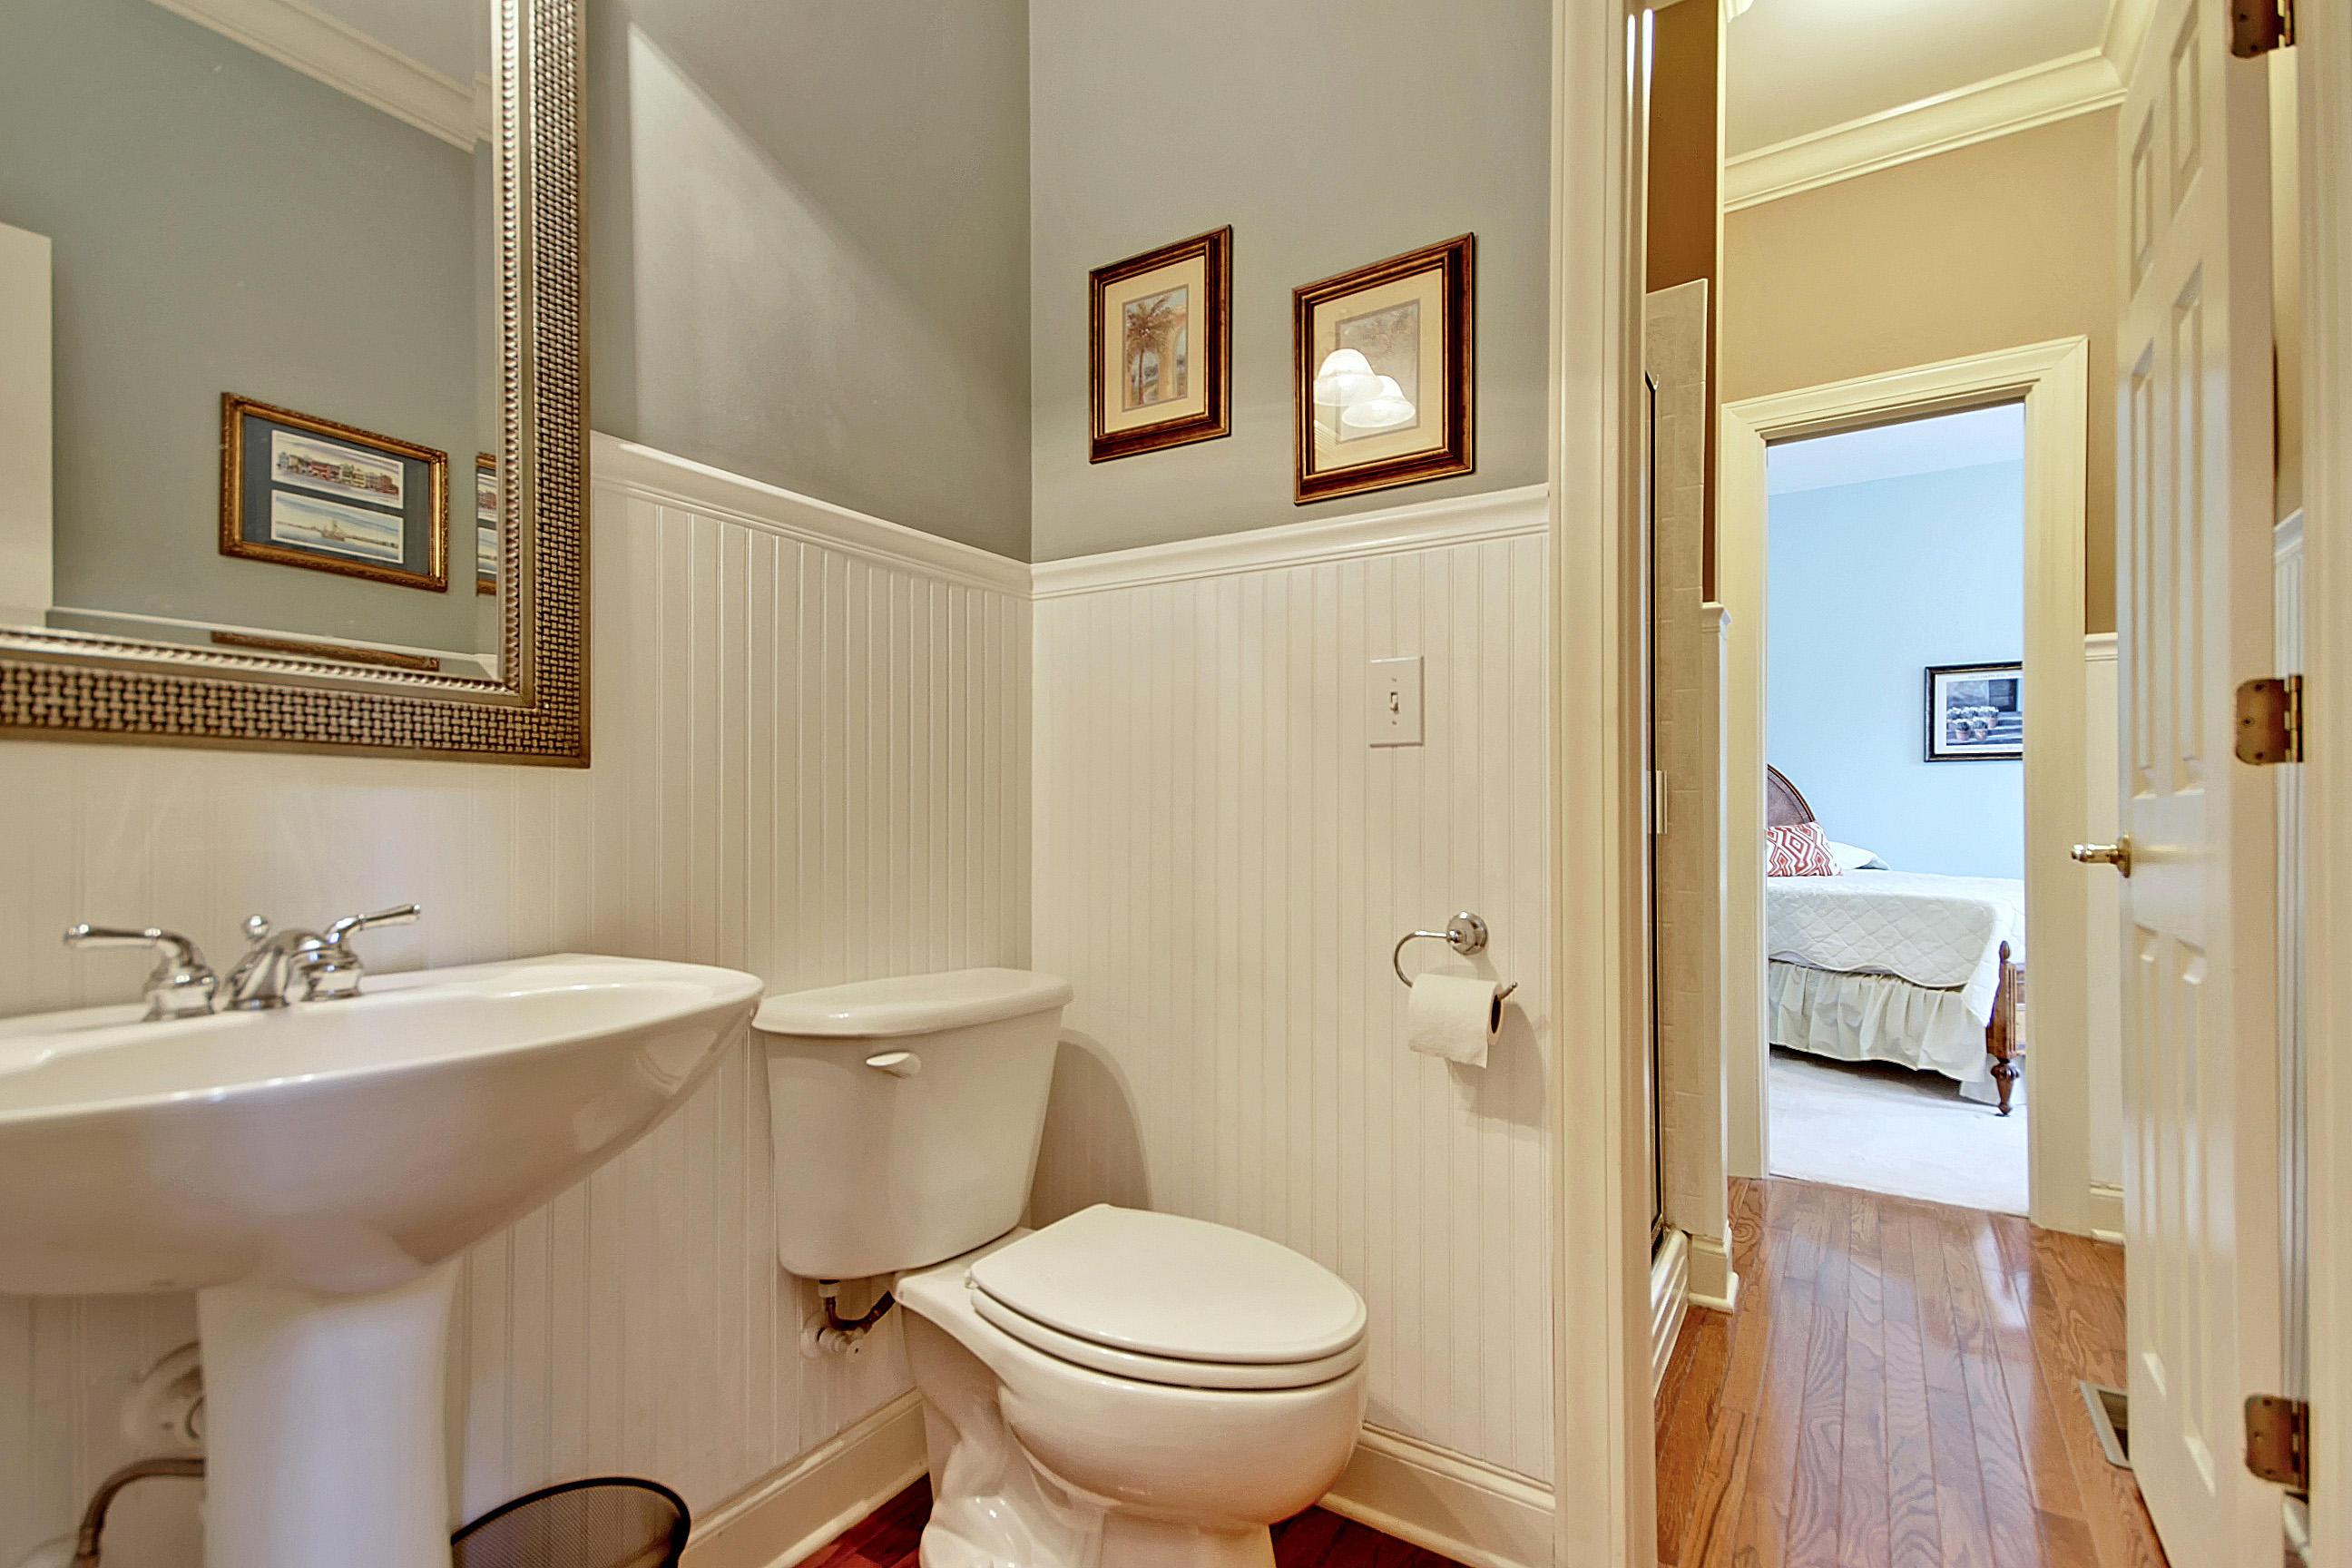 Dunes West Homes For Sale - 2449 Darts Cove, Mount Pleasant, SC - 41